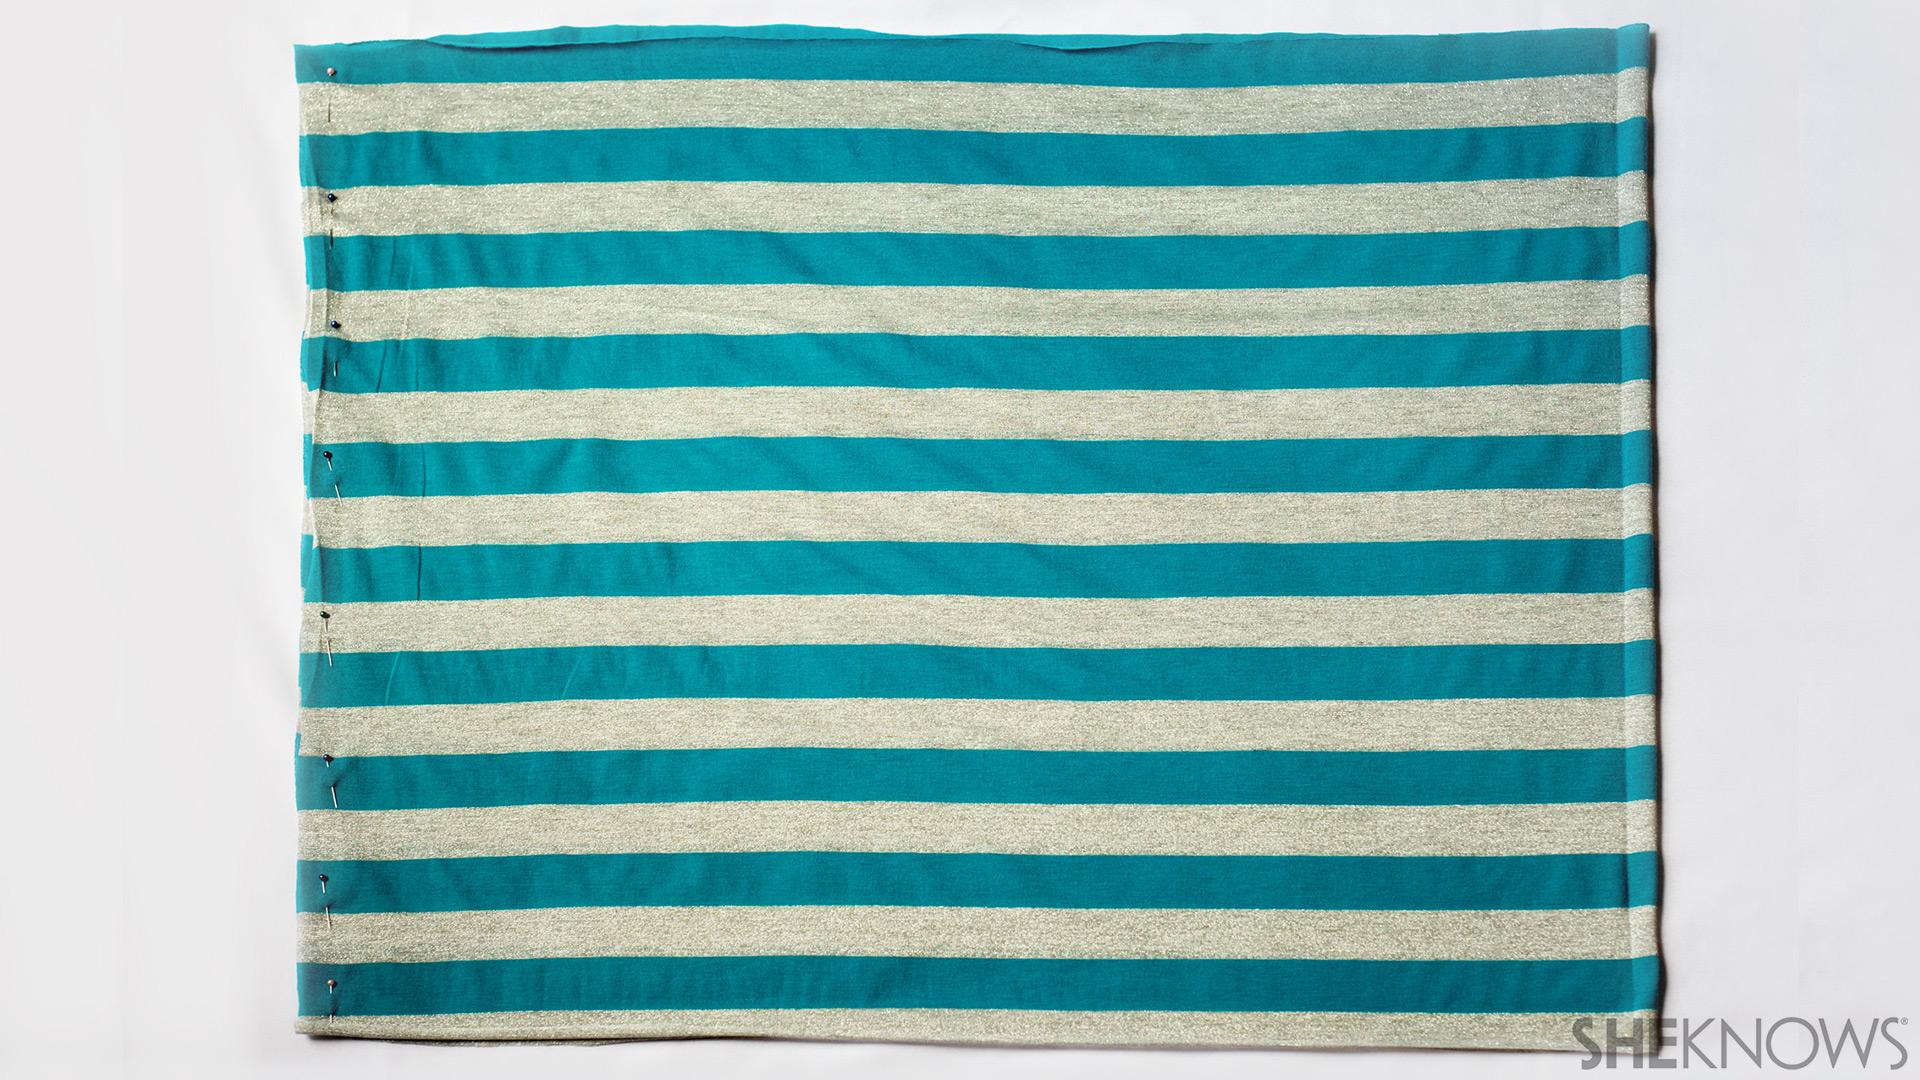 Infinity nursing scarf | Sheknows.com - step 2